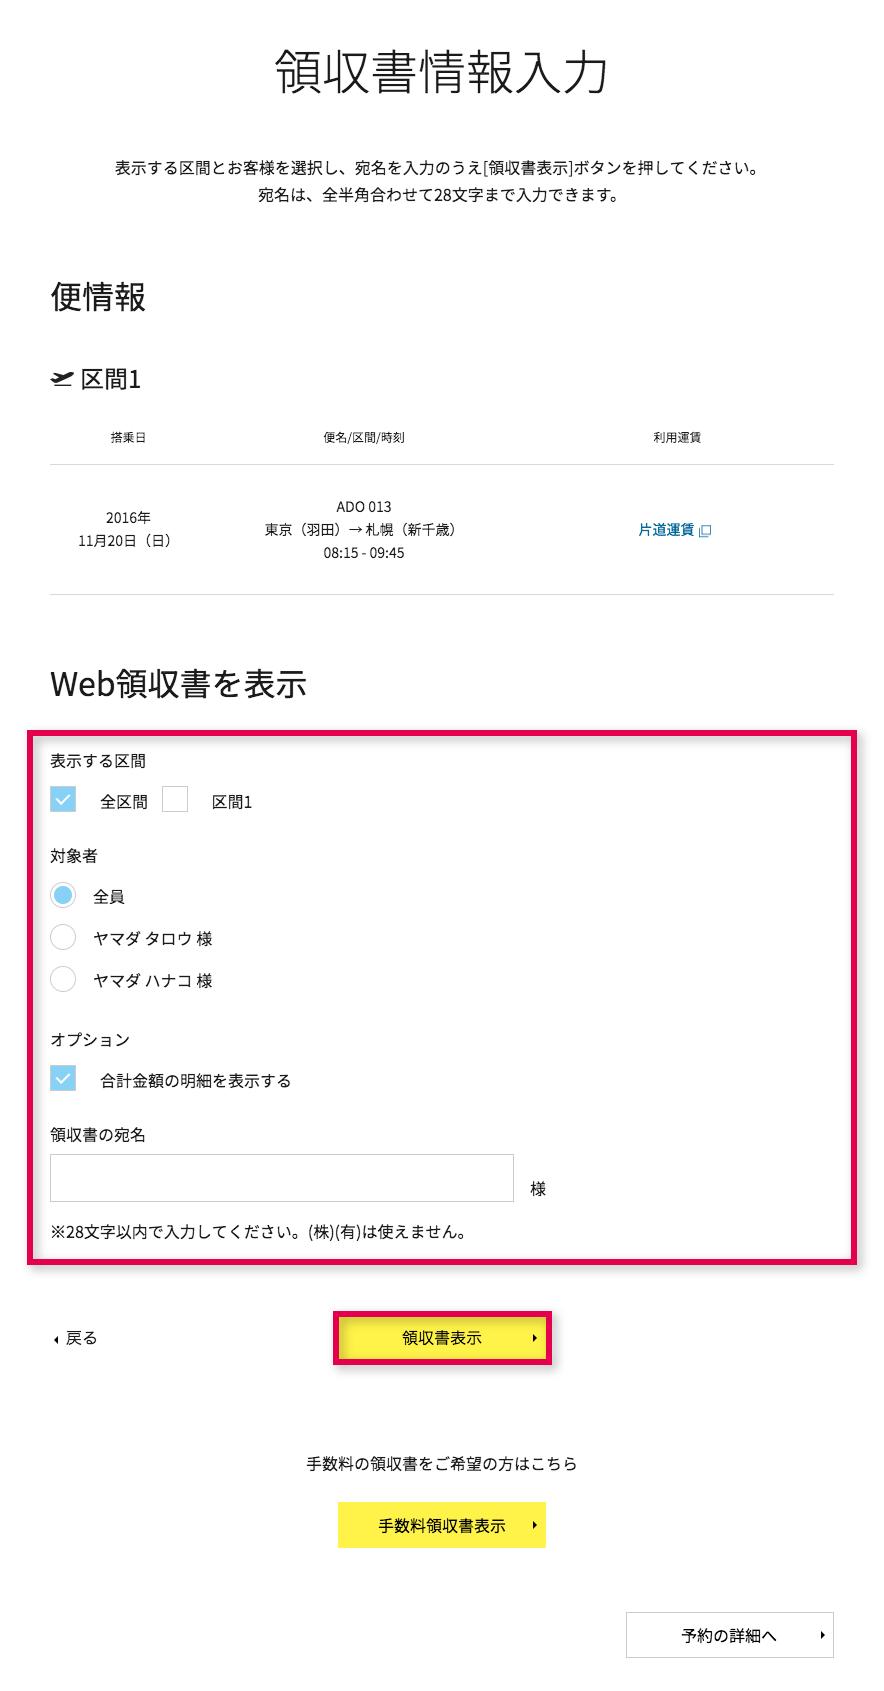 web receipt data display service